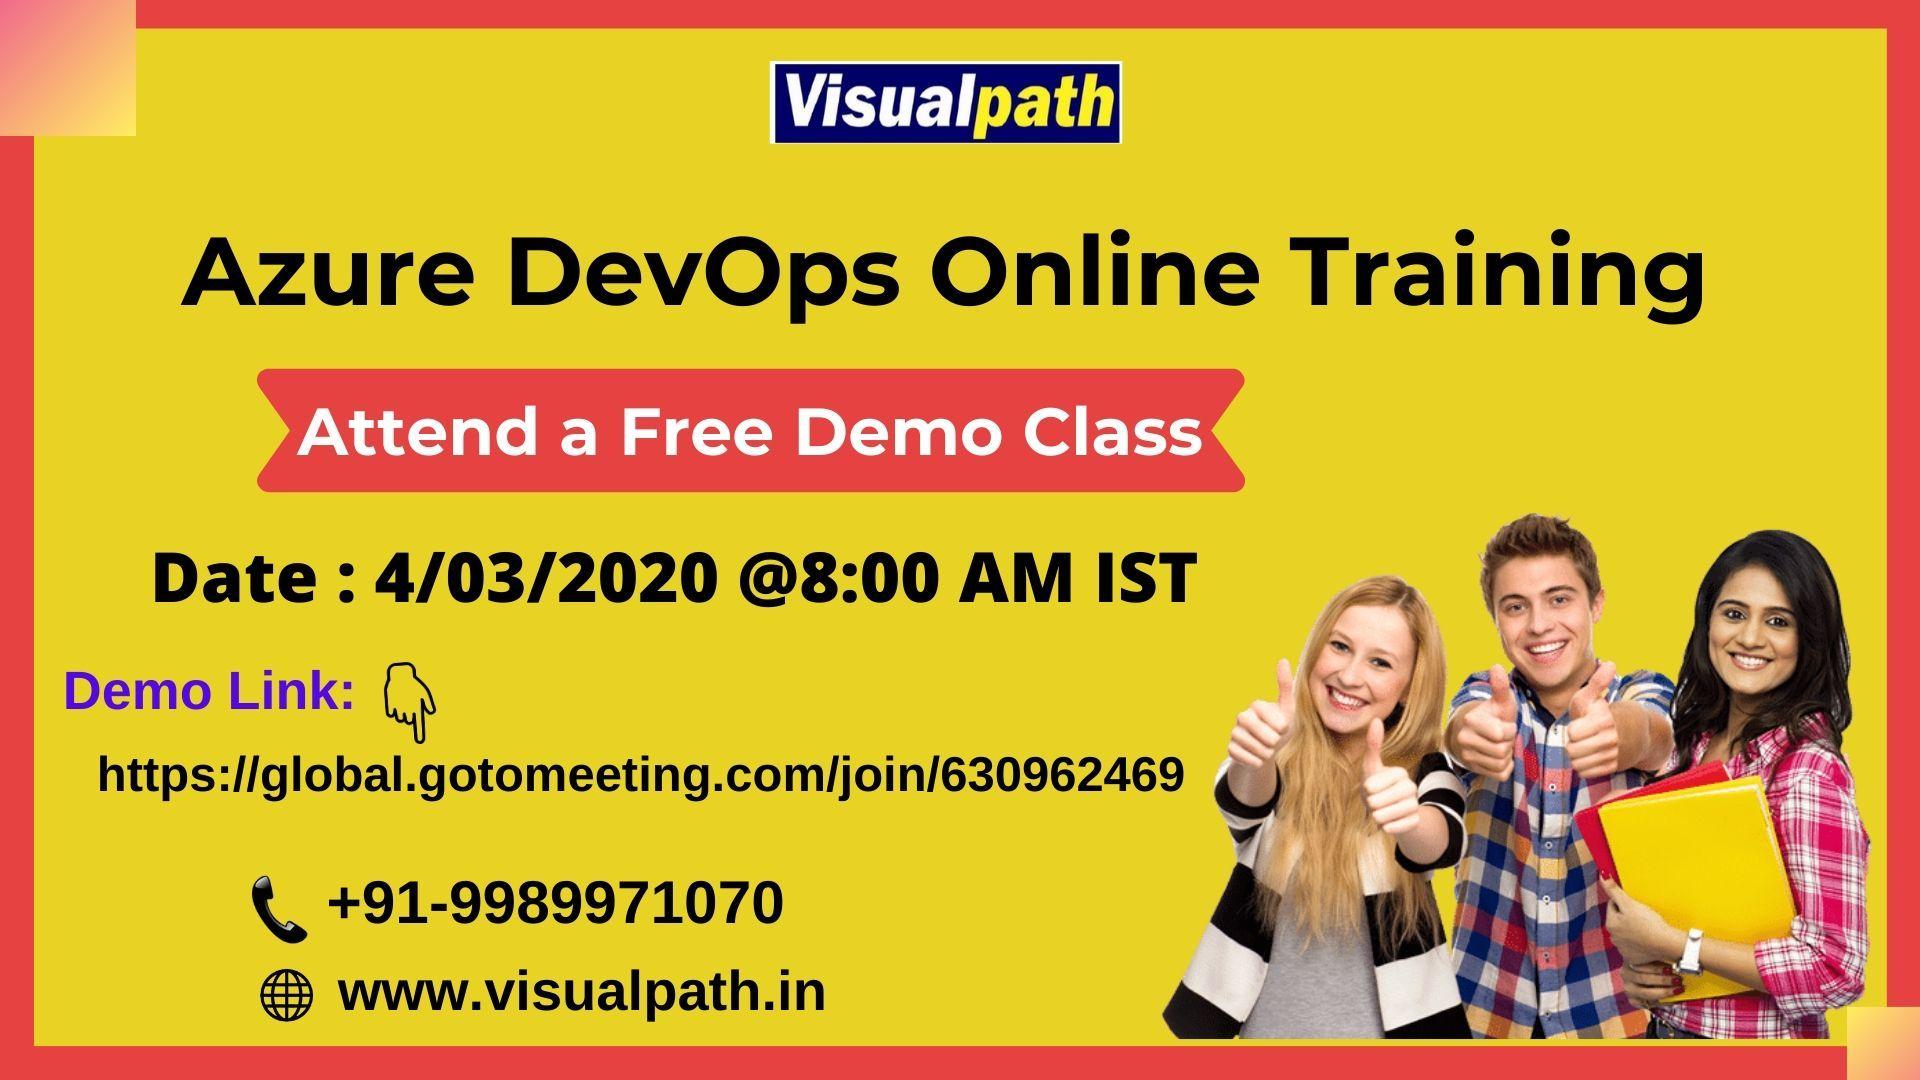 Attend a free demo class on AzureDevOps Online Training